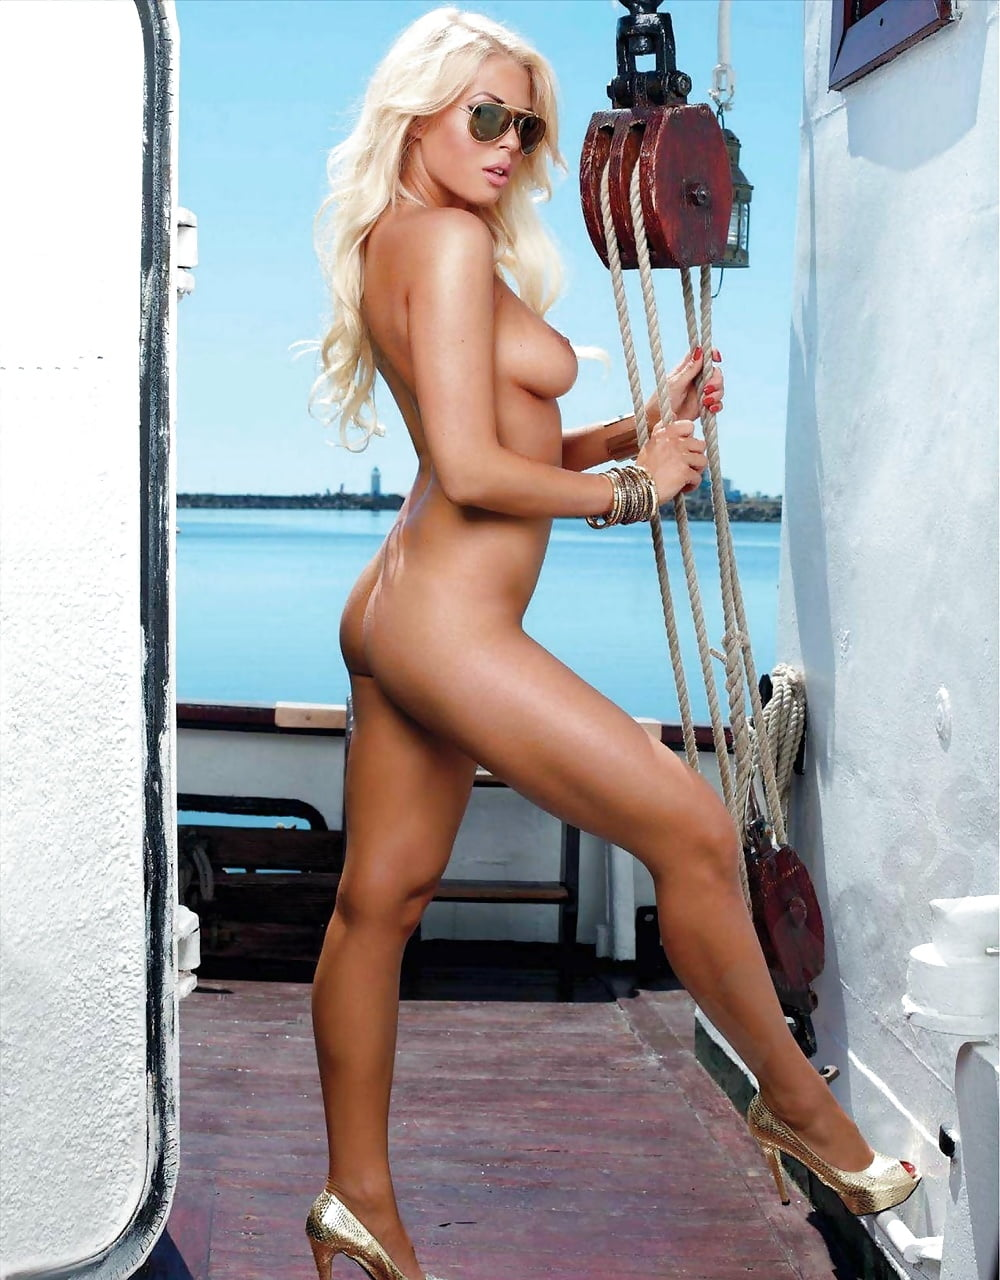 Nude playboy photos of roxana martinez — pic 10